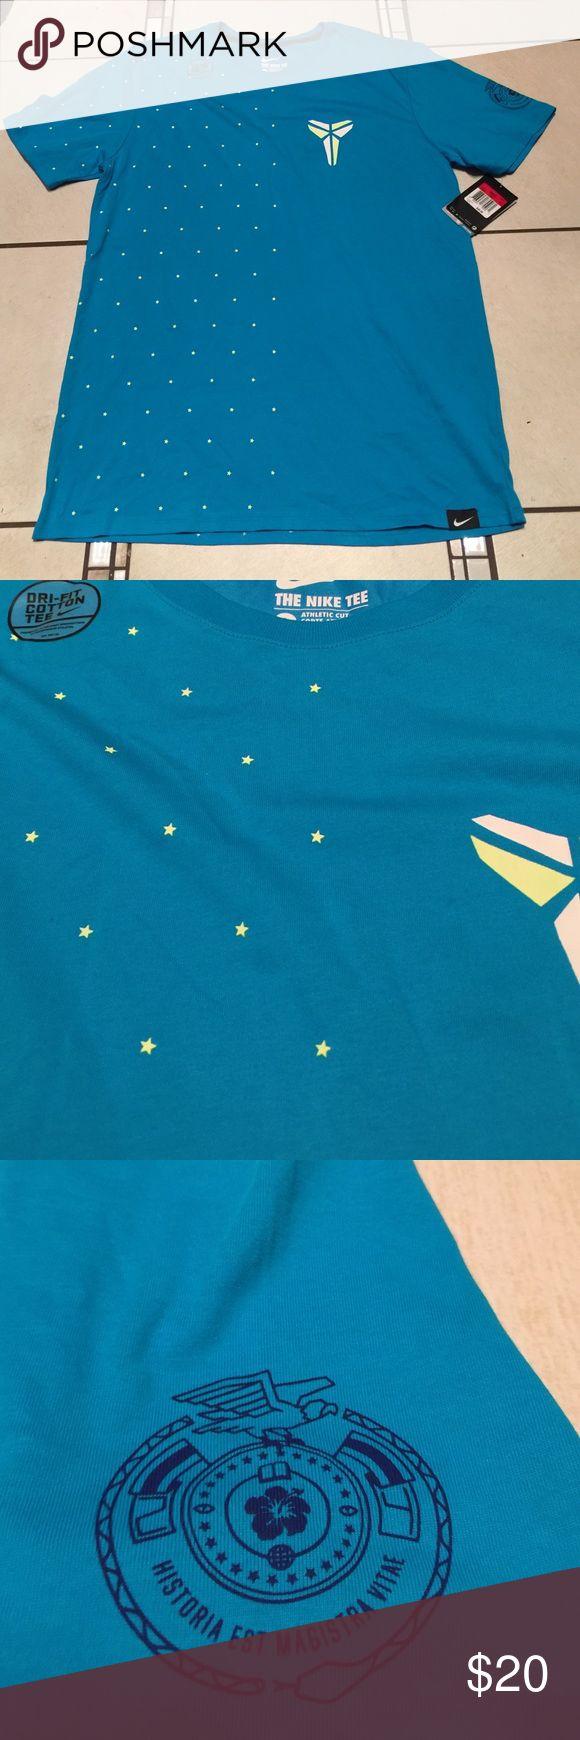 NWT Nike Kobe shirt. PRICE FIRM ❗ NWT Men's Nike Kobe blue with stars Nike Shirts